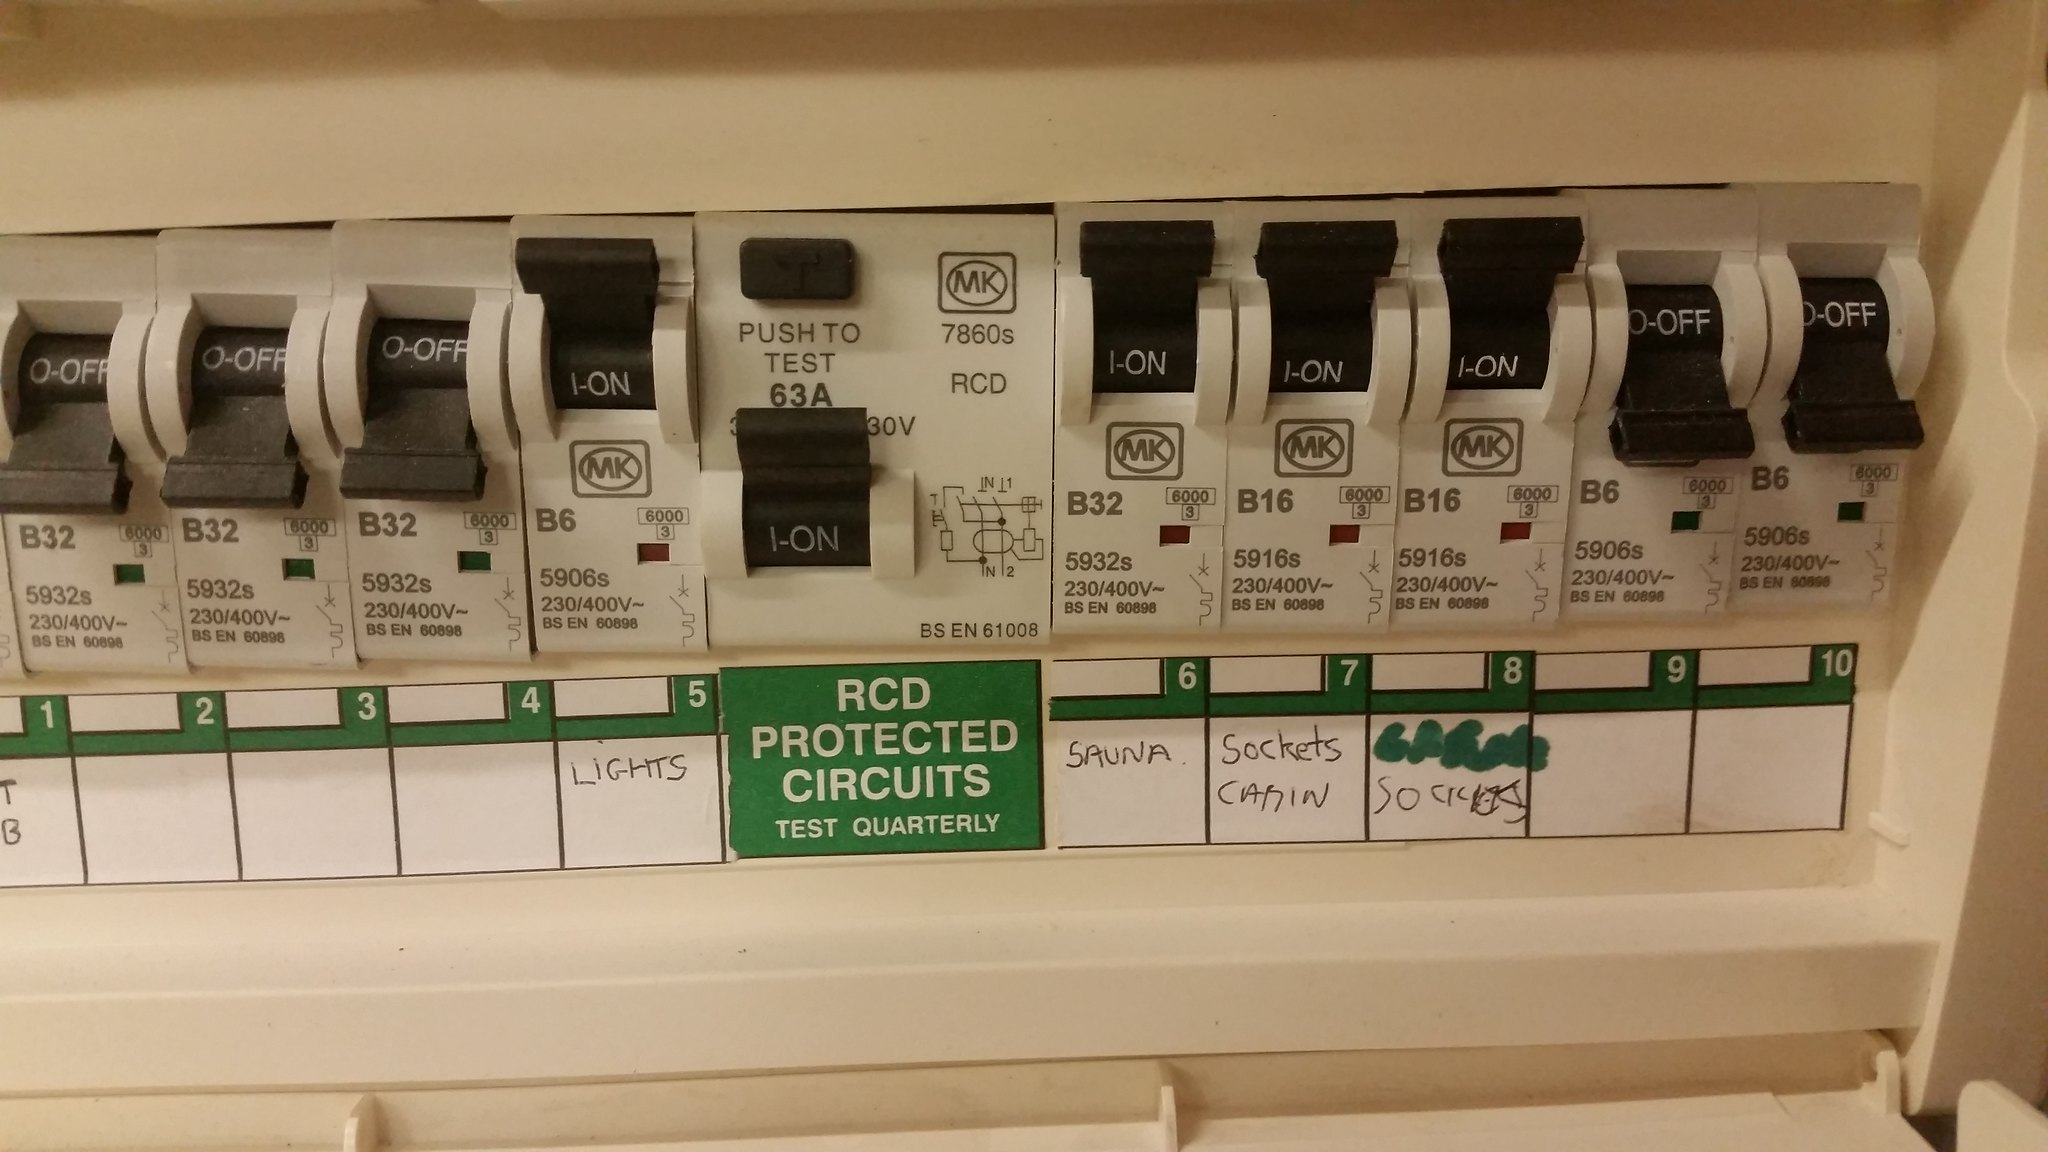 rcd spur wiring diagram 2016 nissan versa radio rewiring the garage electricians to forum please